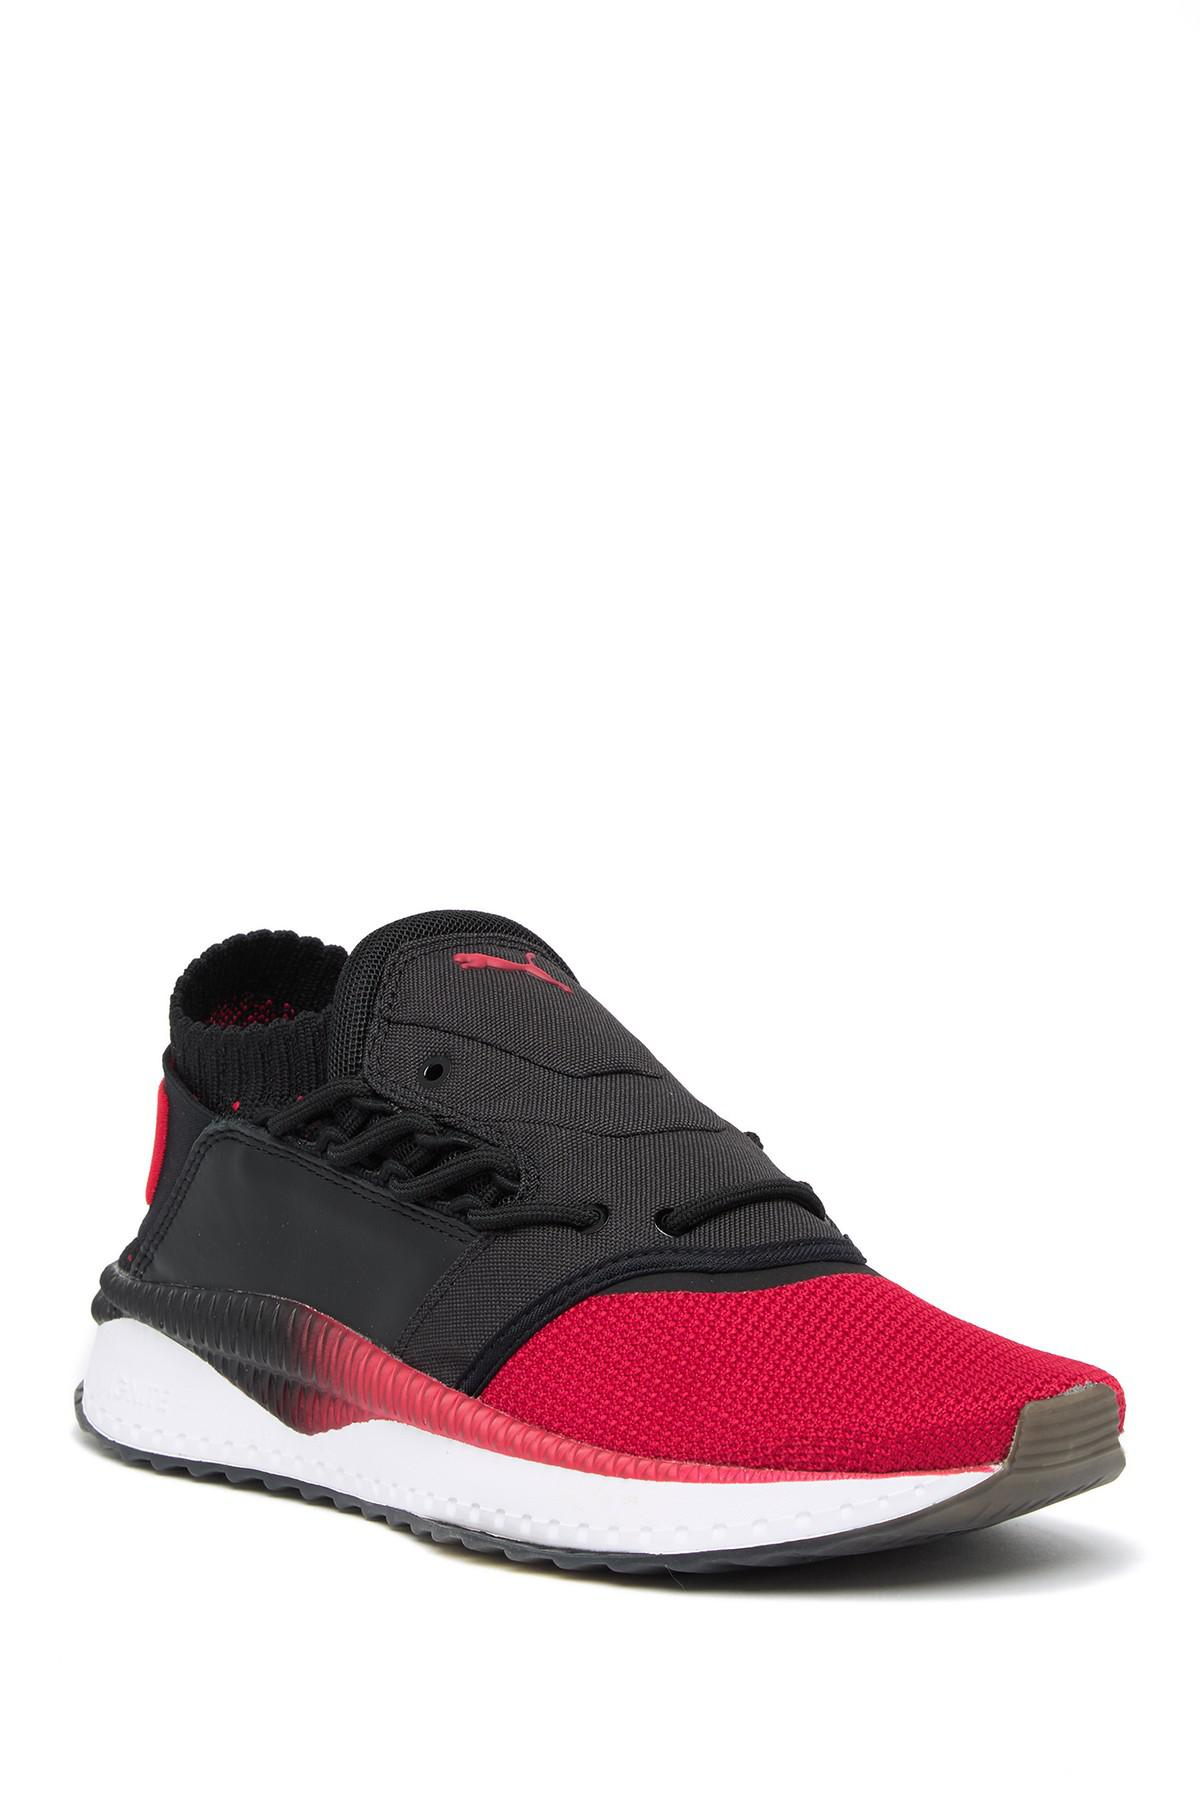 Lyst - PUMA Tsugi Shinsei Nido Athletic Leather Sneaker in Black for Men 11304f553